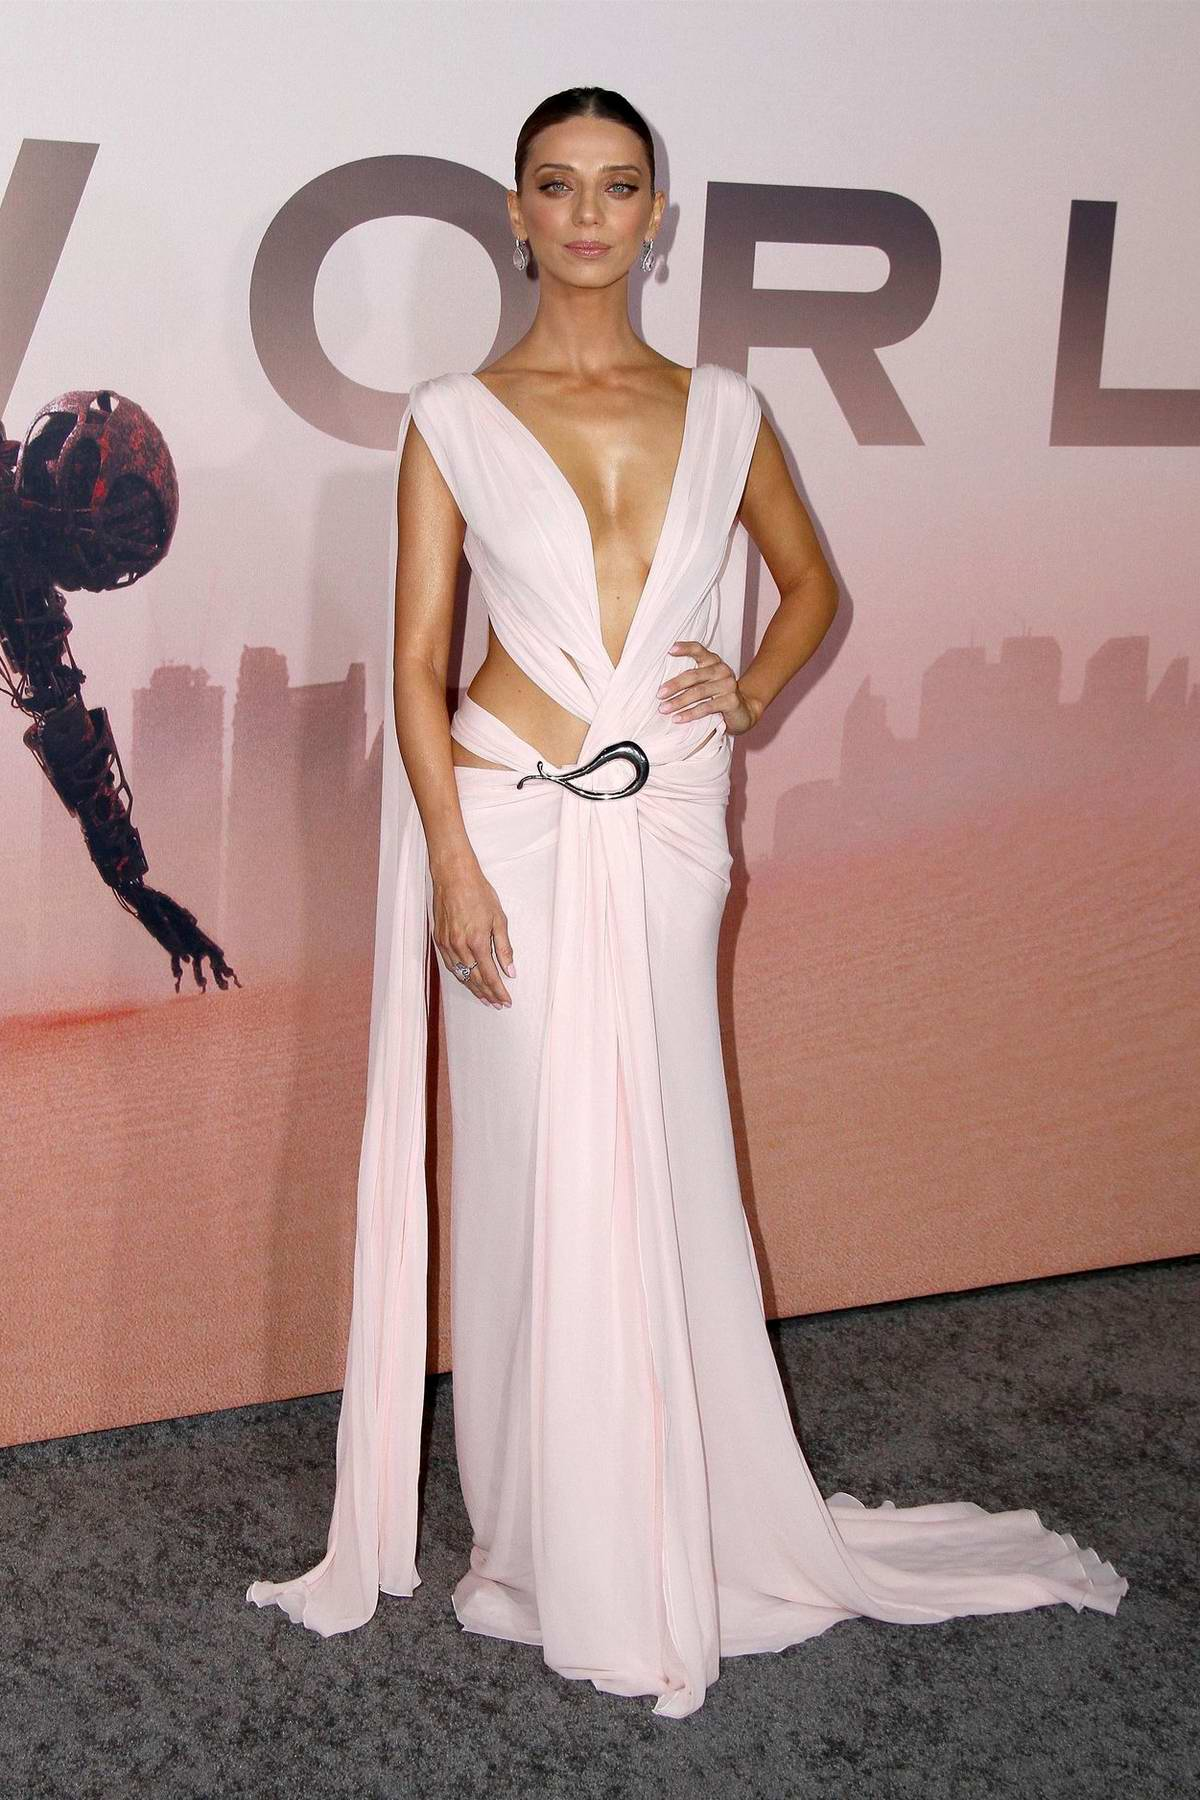 Angela Sarafyan attends the Premiere of 'Westworld', Season 3 in Hollywood, California